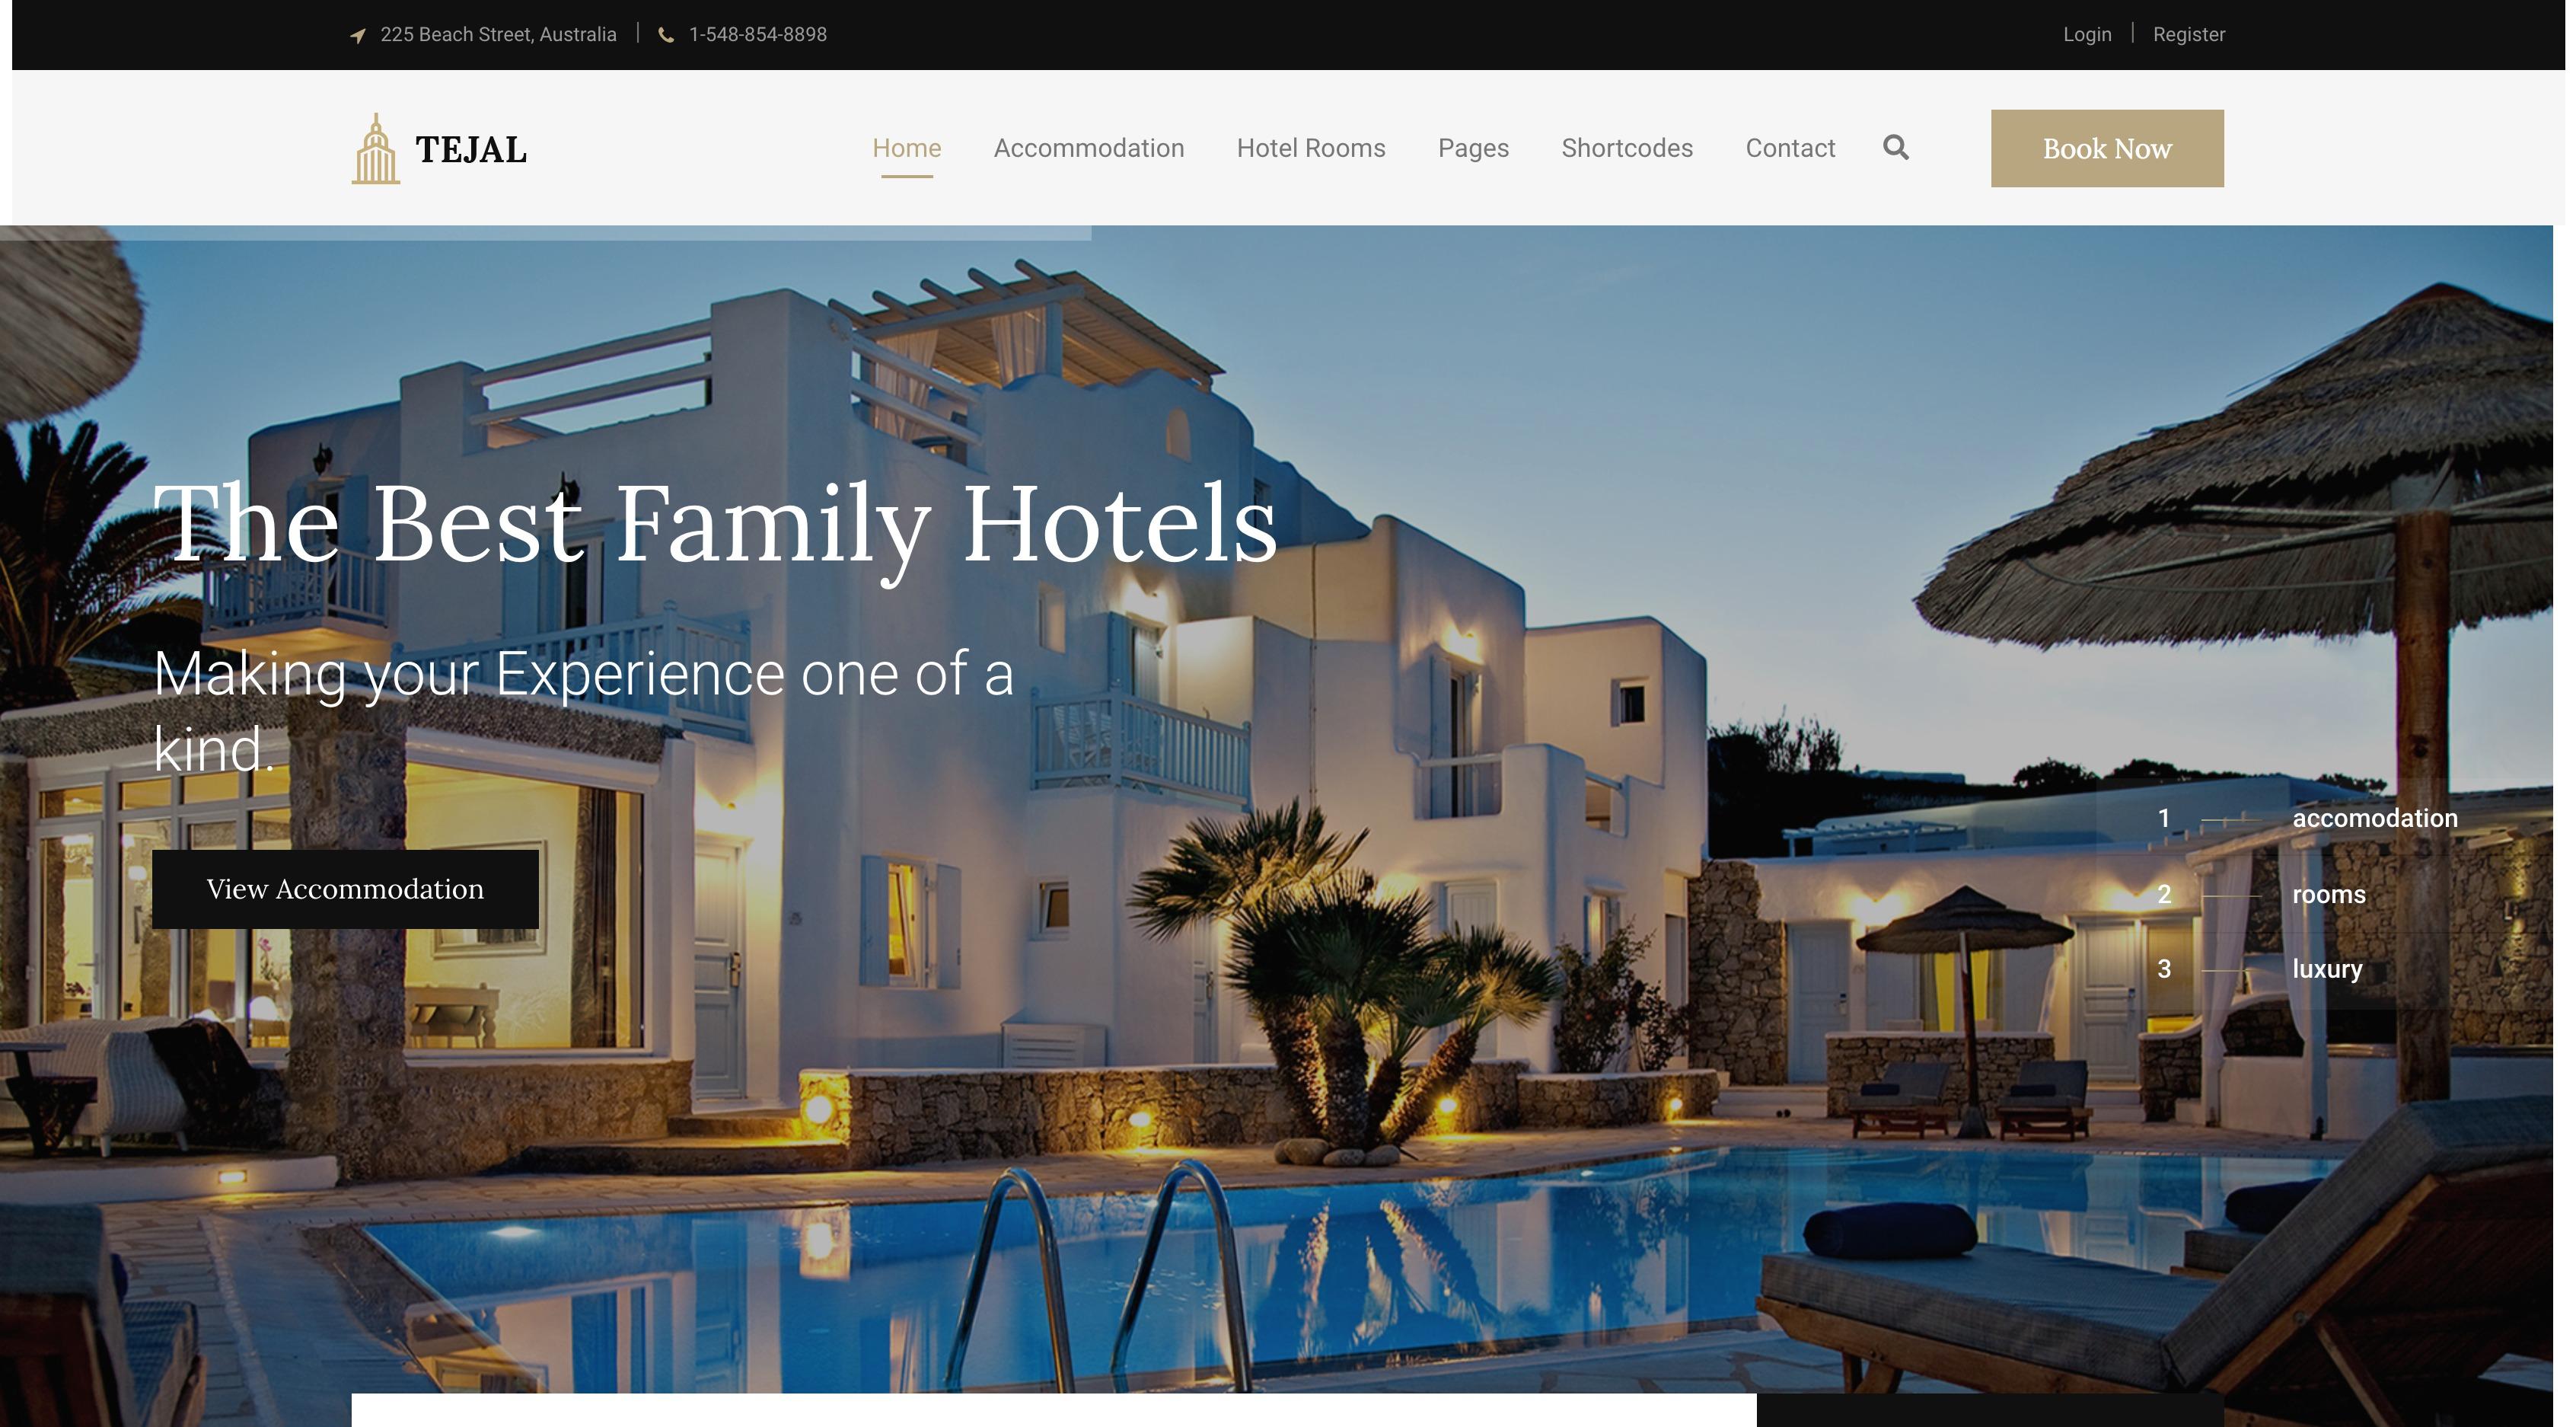 Tejal-酒店民宿度假预定WordPress主题